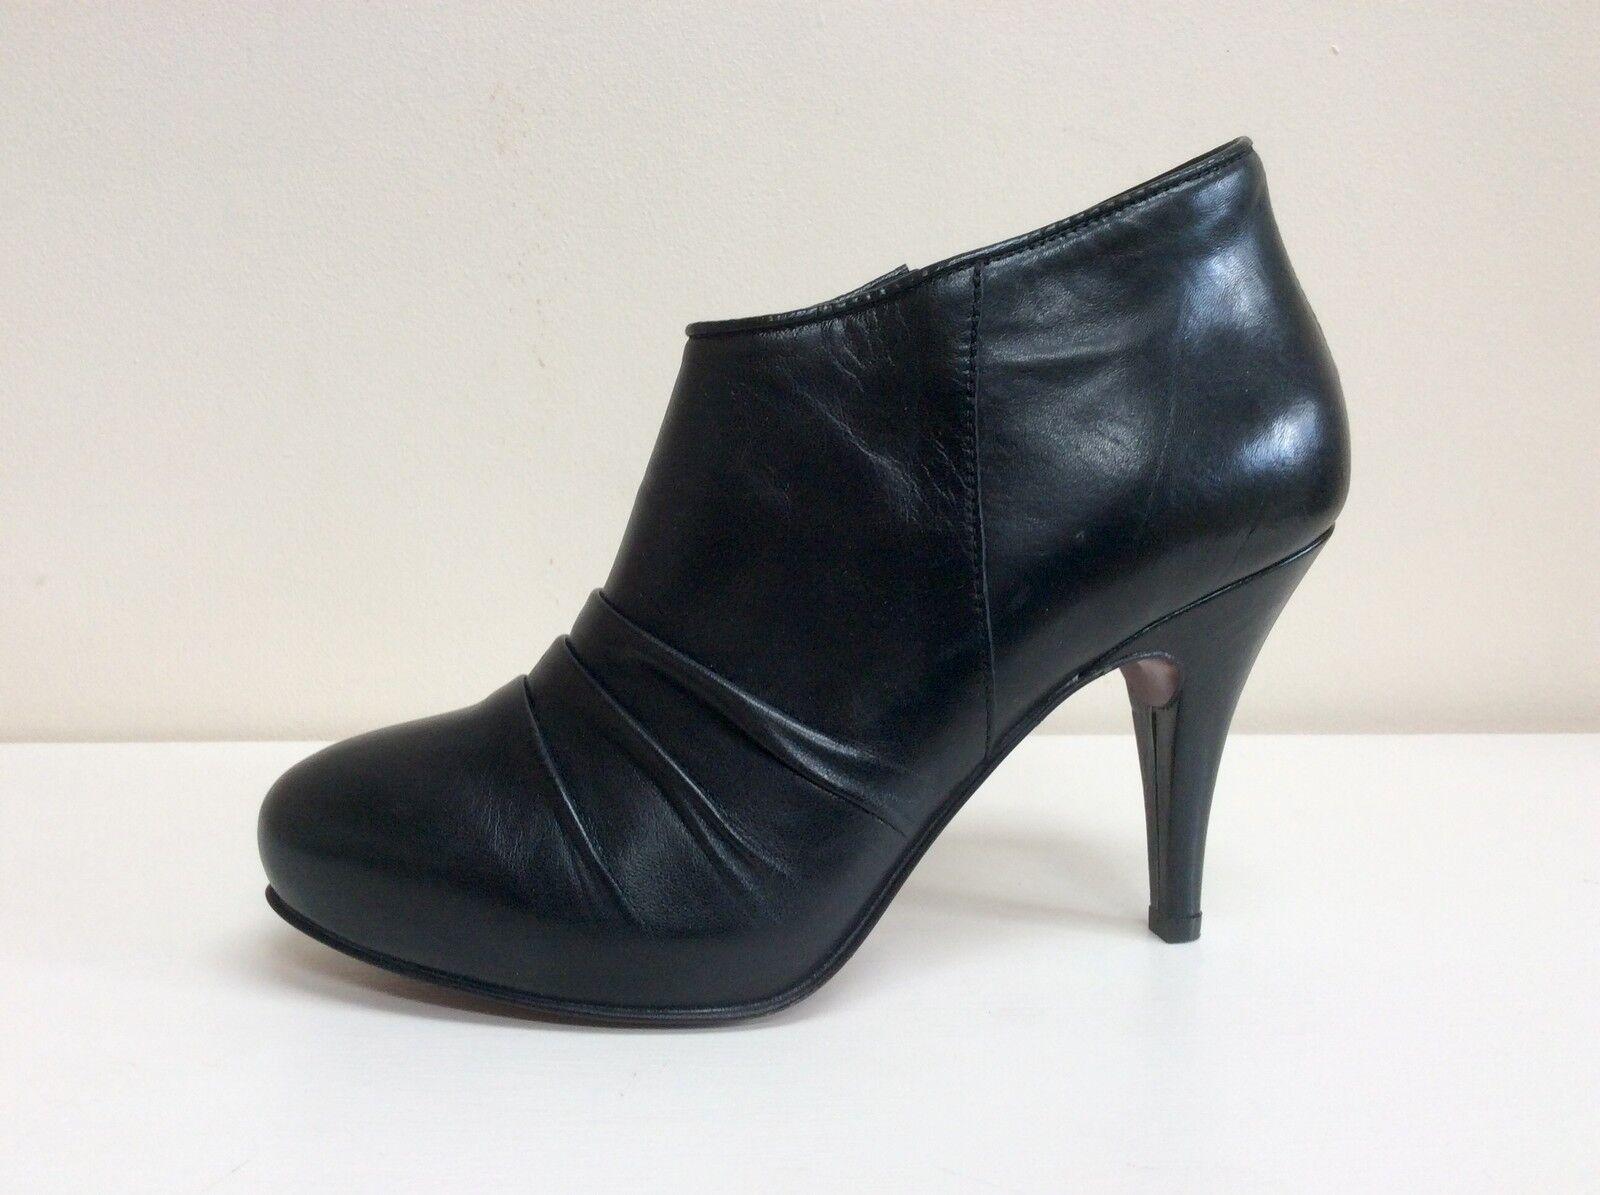 Geox De Zapato De Geox Cuero Negro Sigourney Botas, Reino Unido 7/BNWB dd1ae5